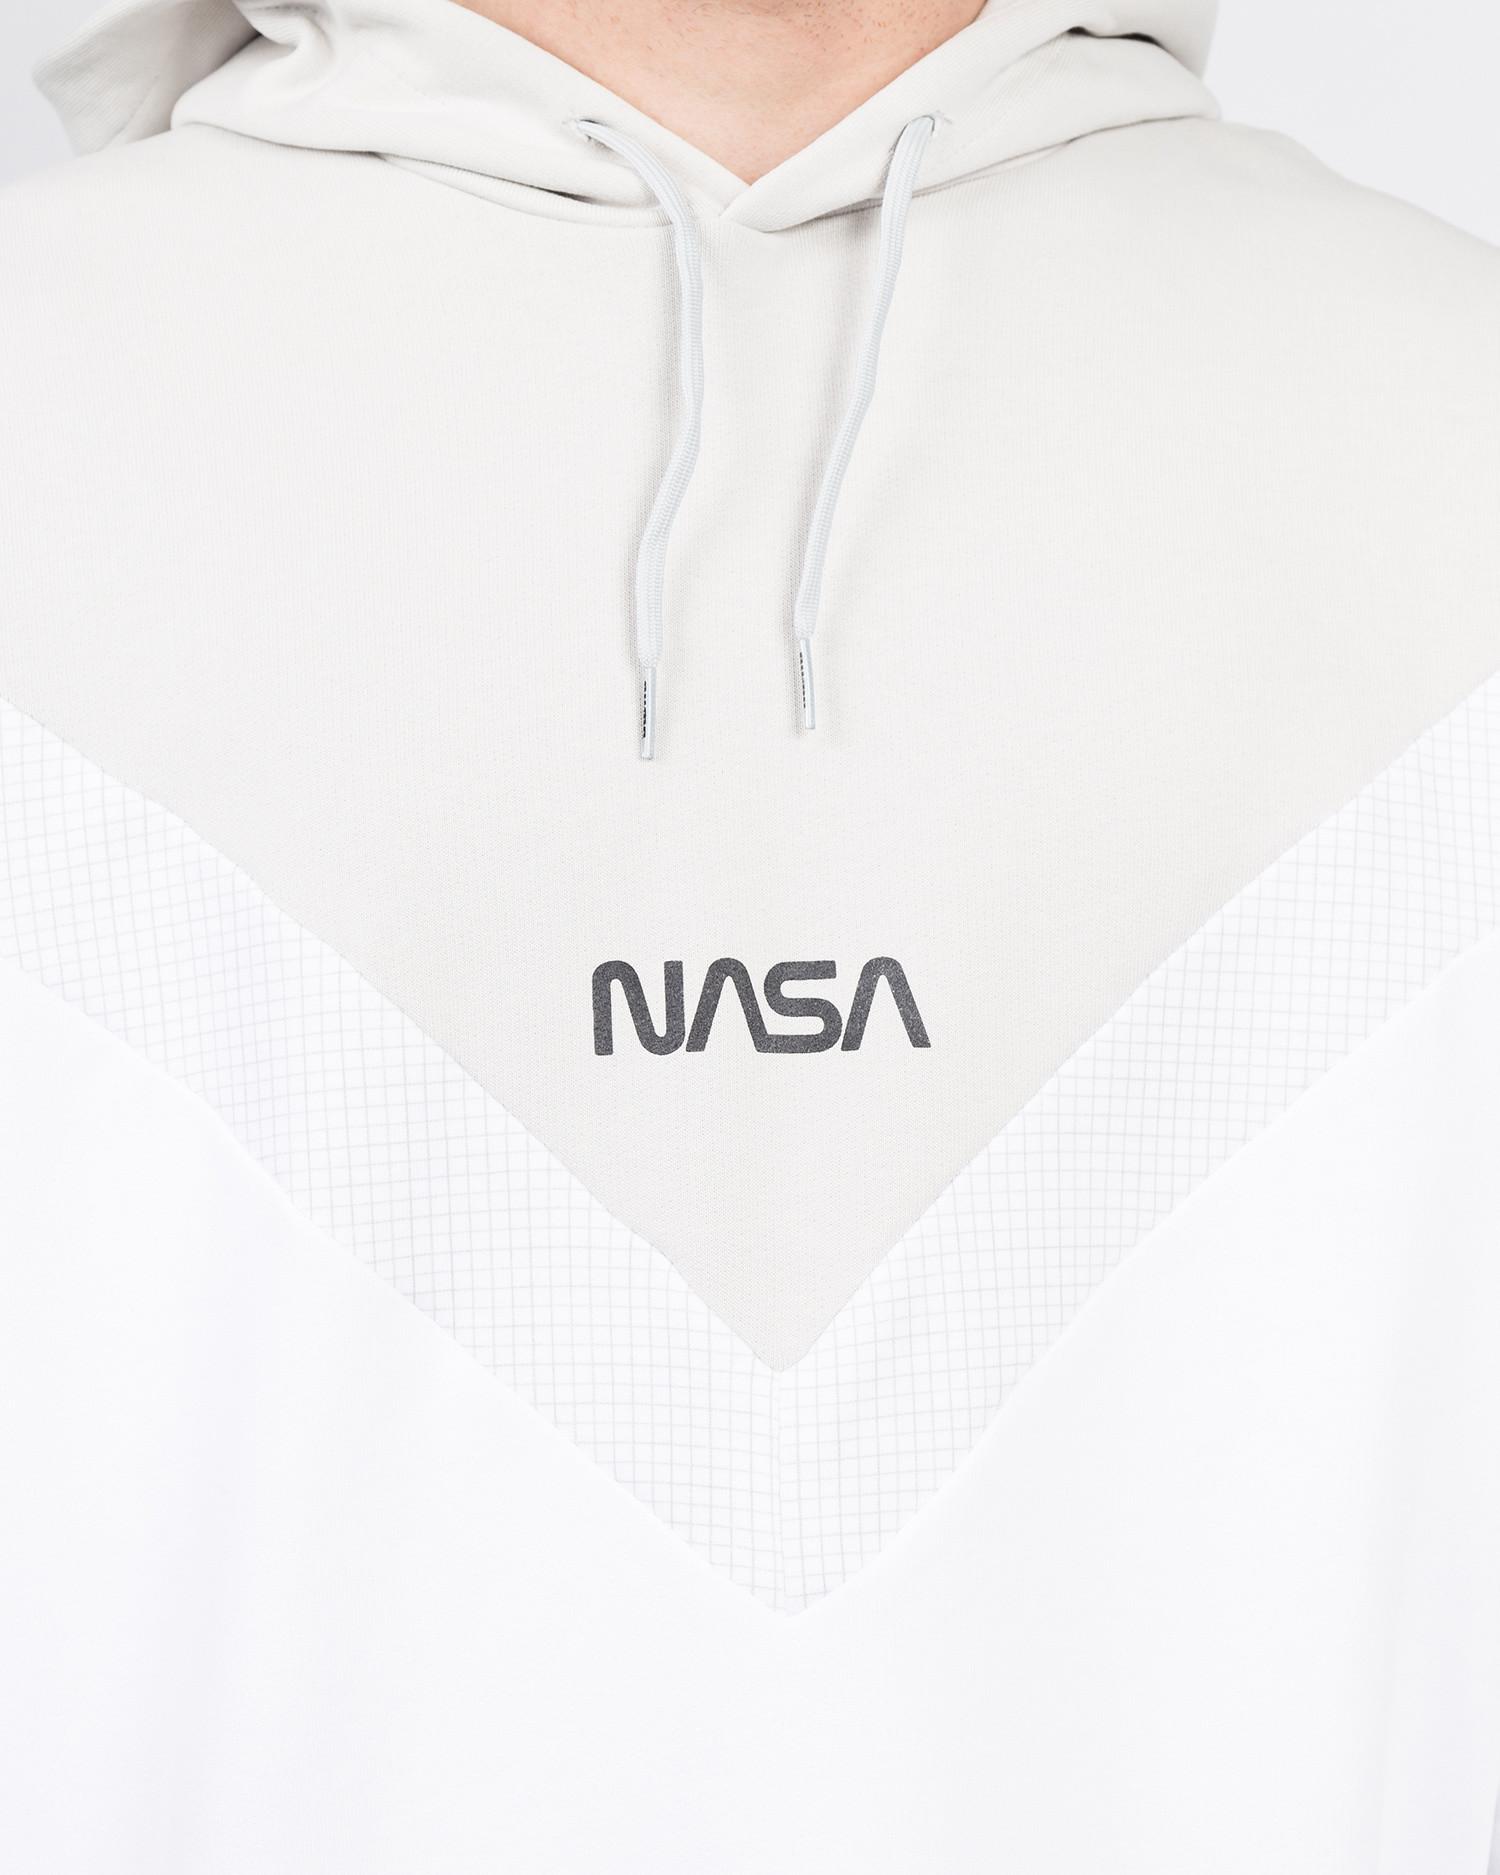 Puma  Space Agency Hoody/Puma White